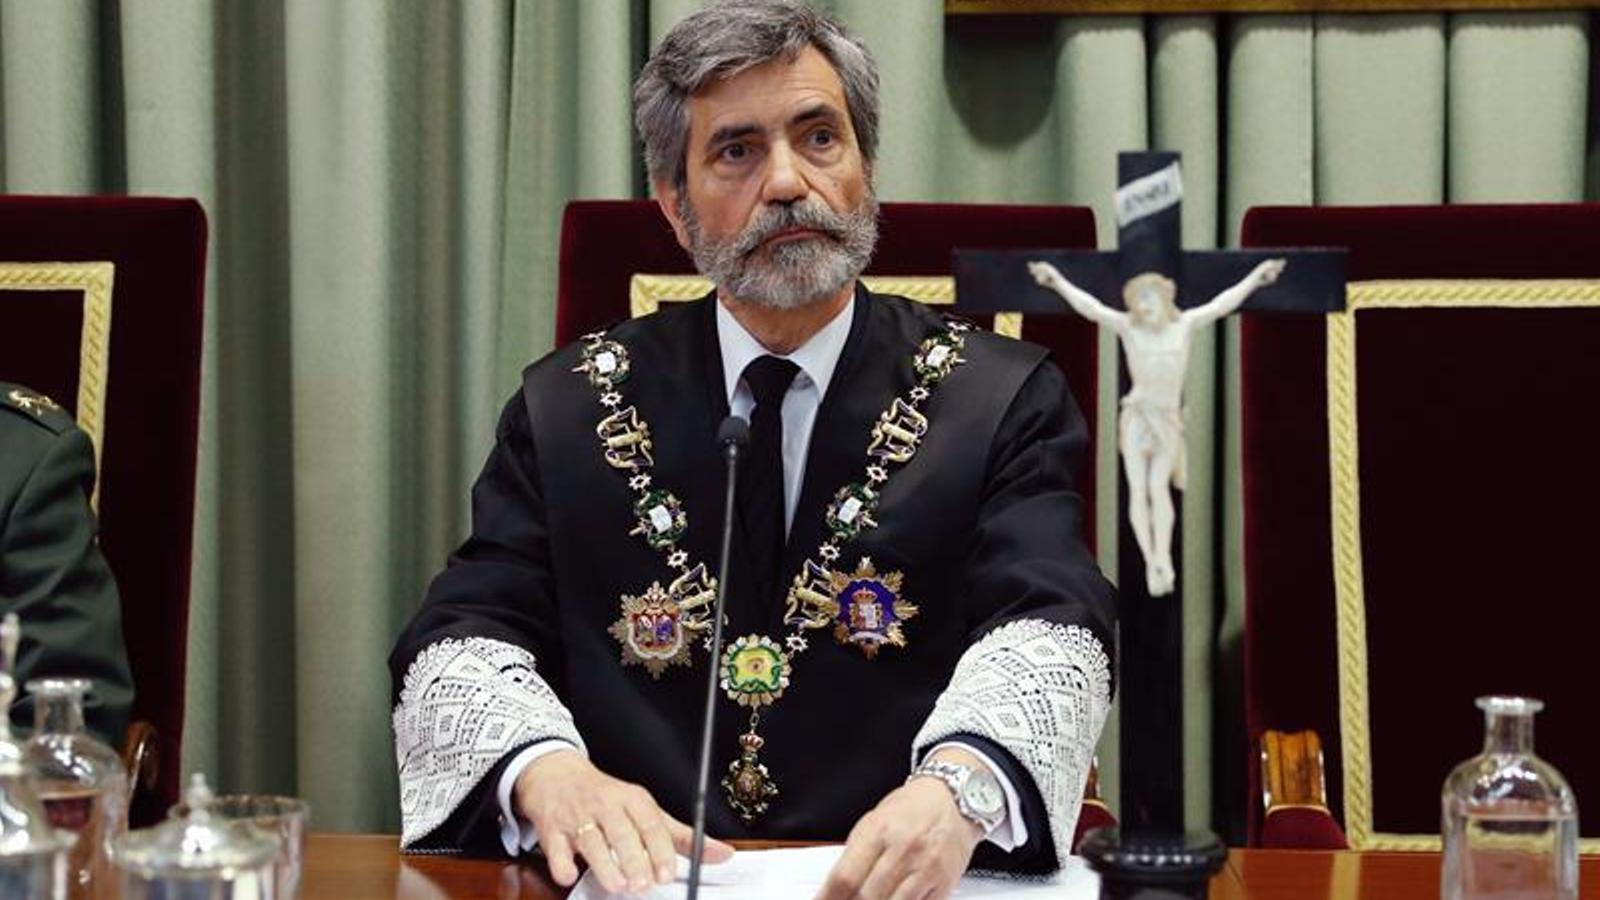 L'encara president del CGPJ, Carlos Lesmes.